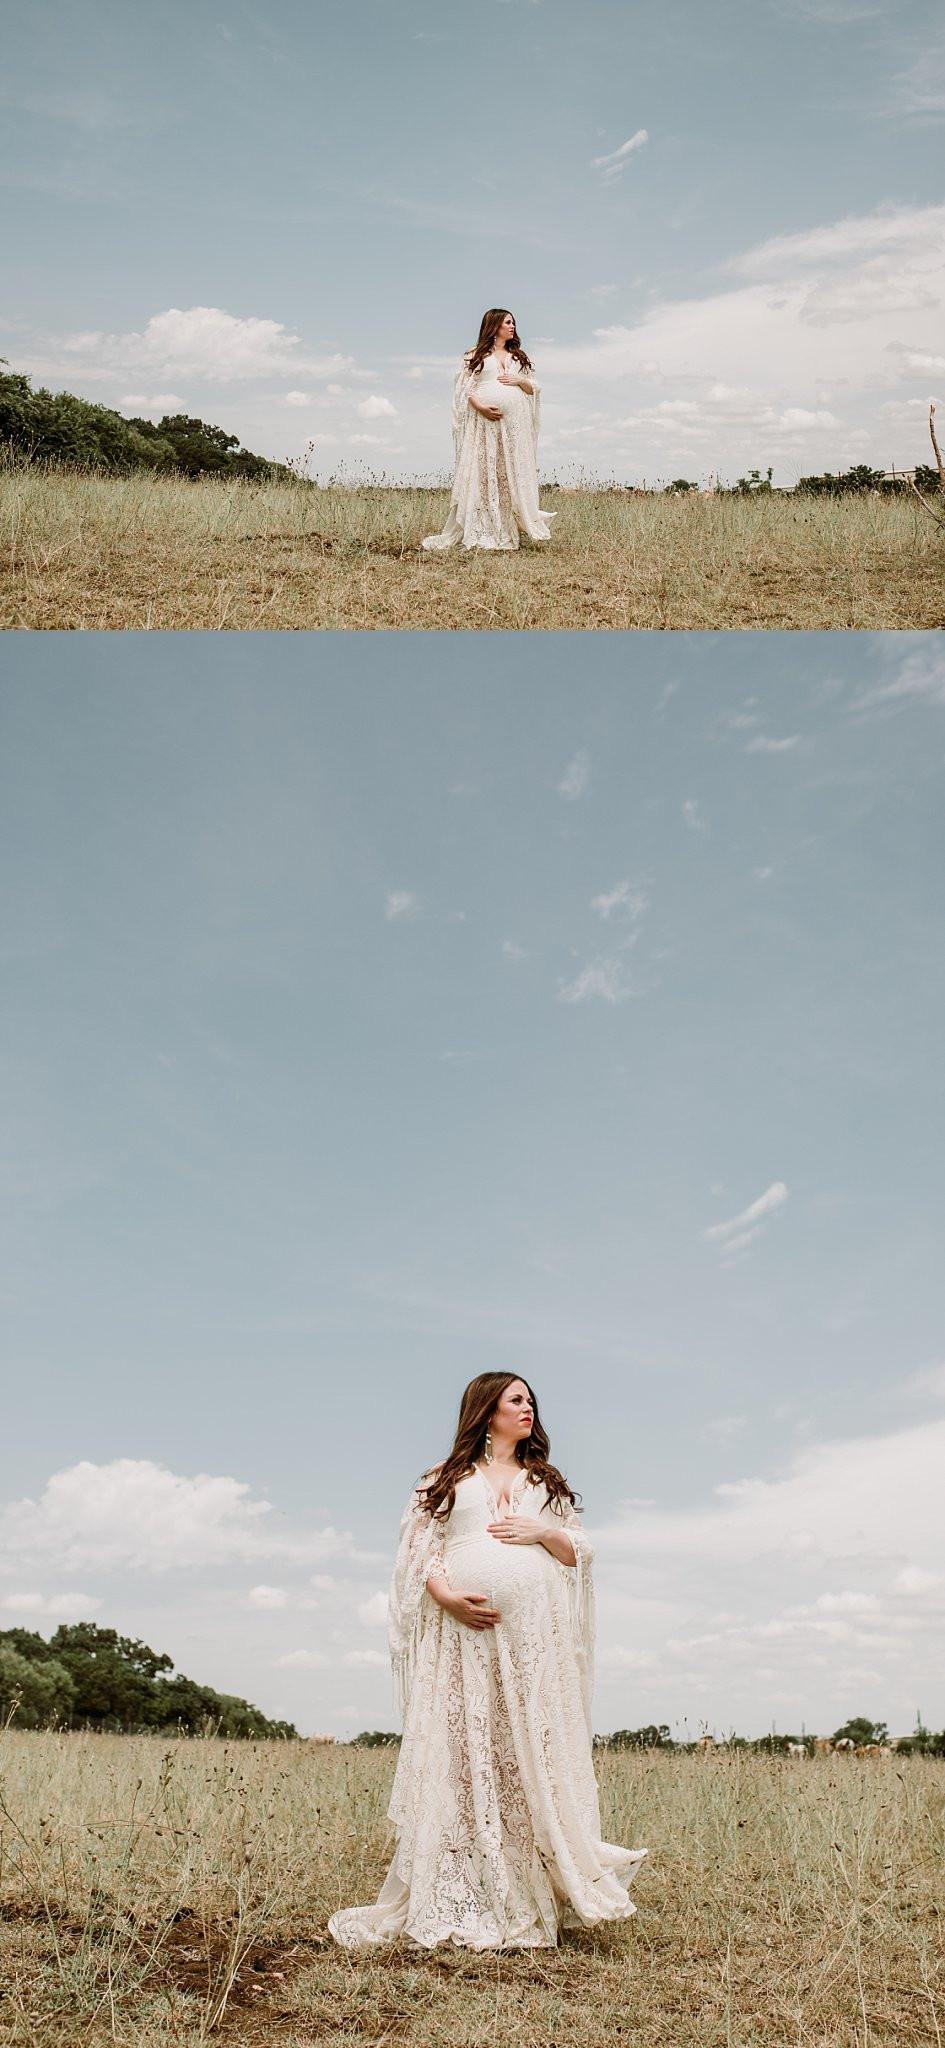 Family + Maternity Photographer in Boerne, TX | Boerne Photographer | Boerne Maternity Photographer | Family Photographer in Boerne, TX | San Antonio Maternity Photos | Photos at La Casa Chic in San Antonio, TX | Mama Bump Maternity Dress Rental | Maternity Dress Ideas